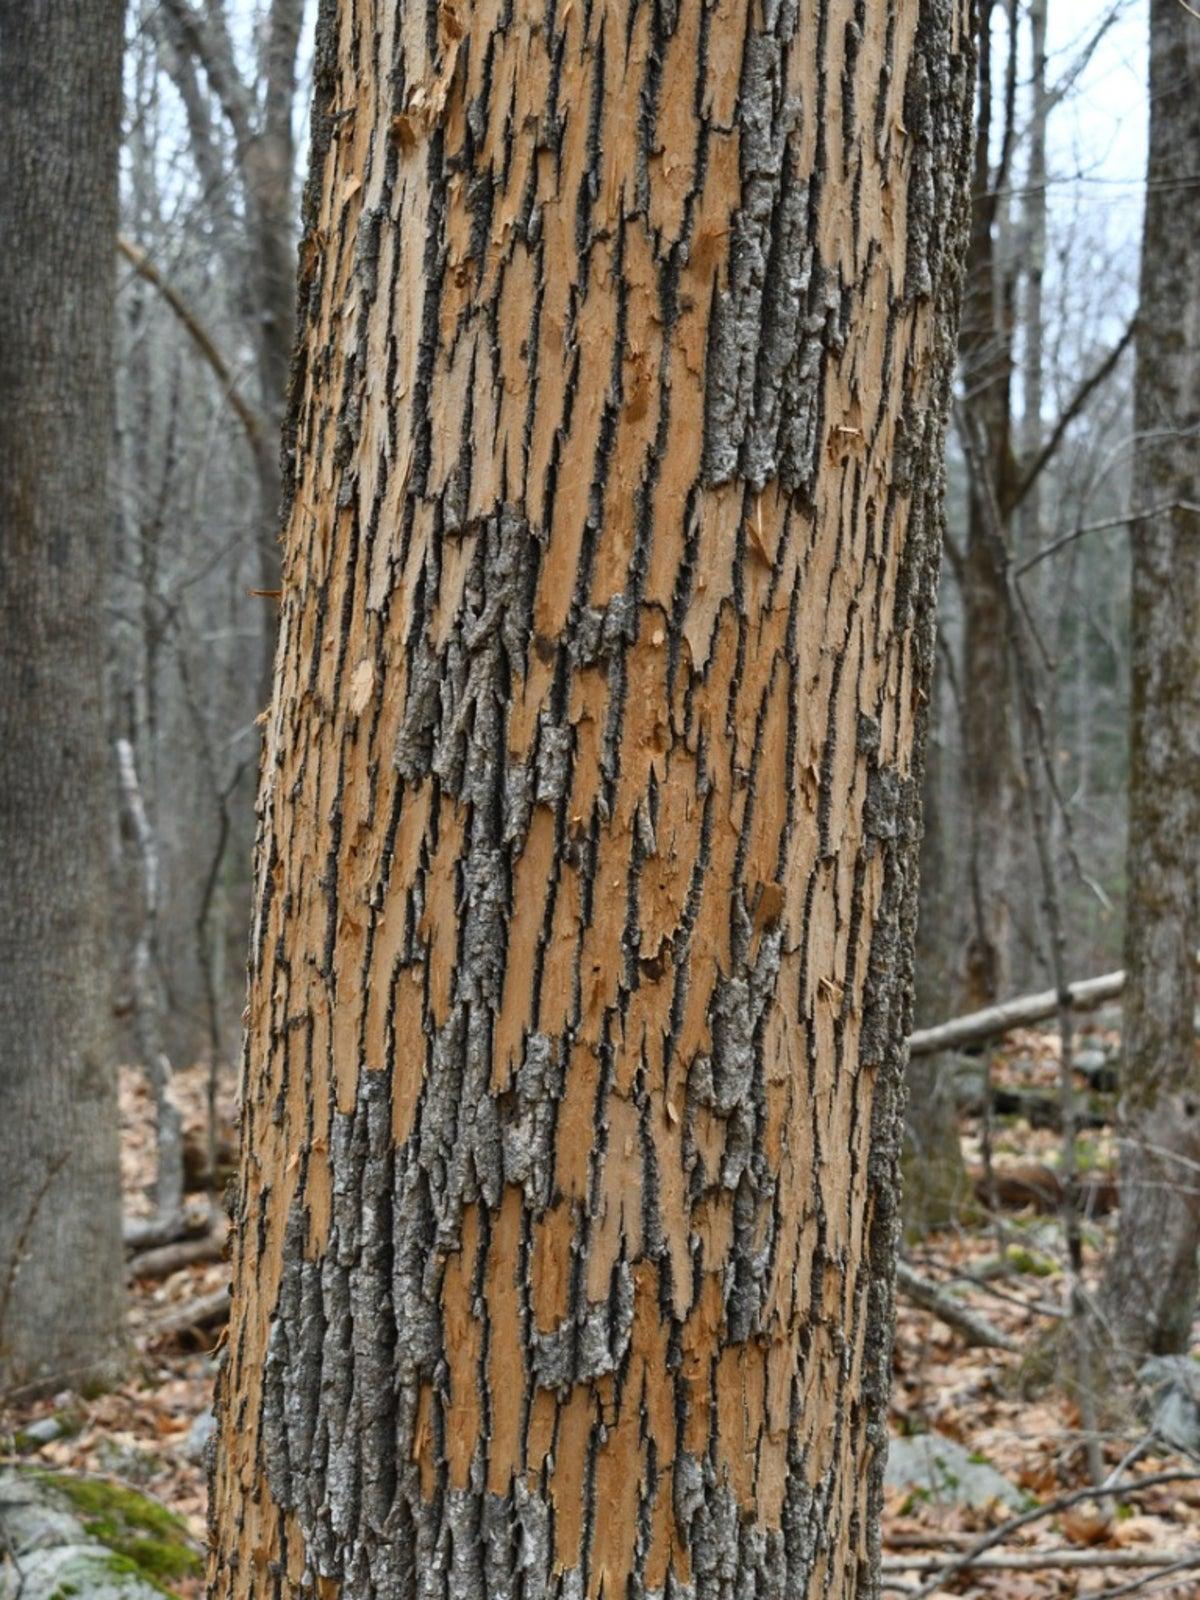 Ash Tree Bark Peeling Reasons For Bark Coming Off Ash Trees